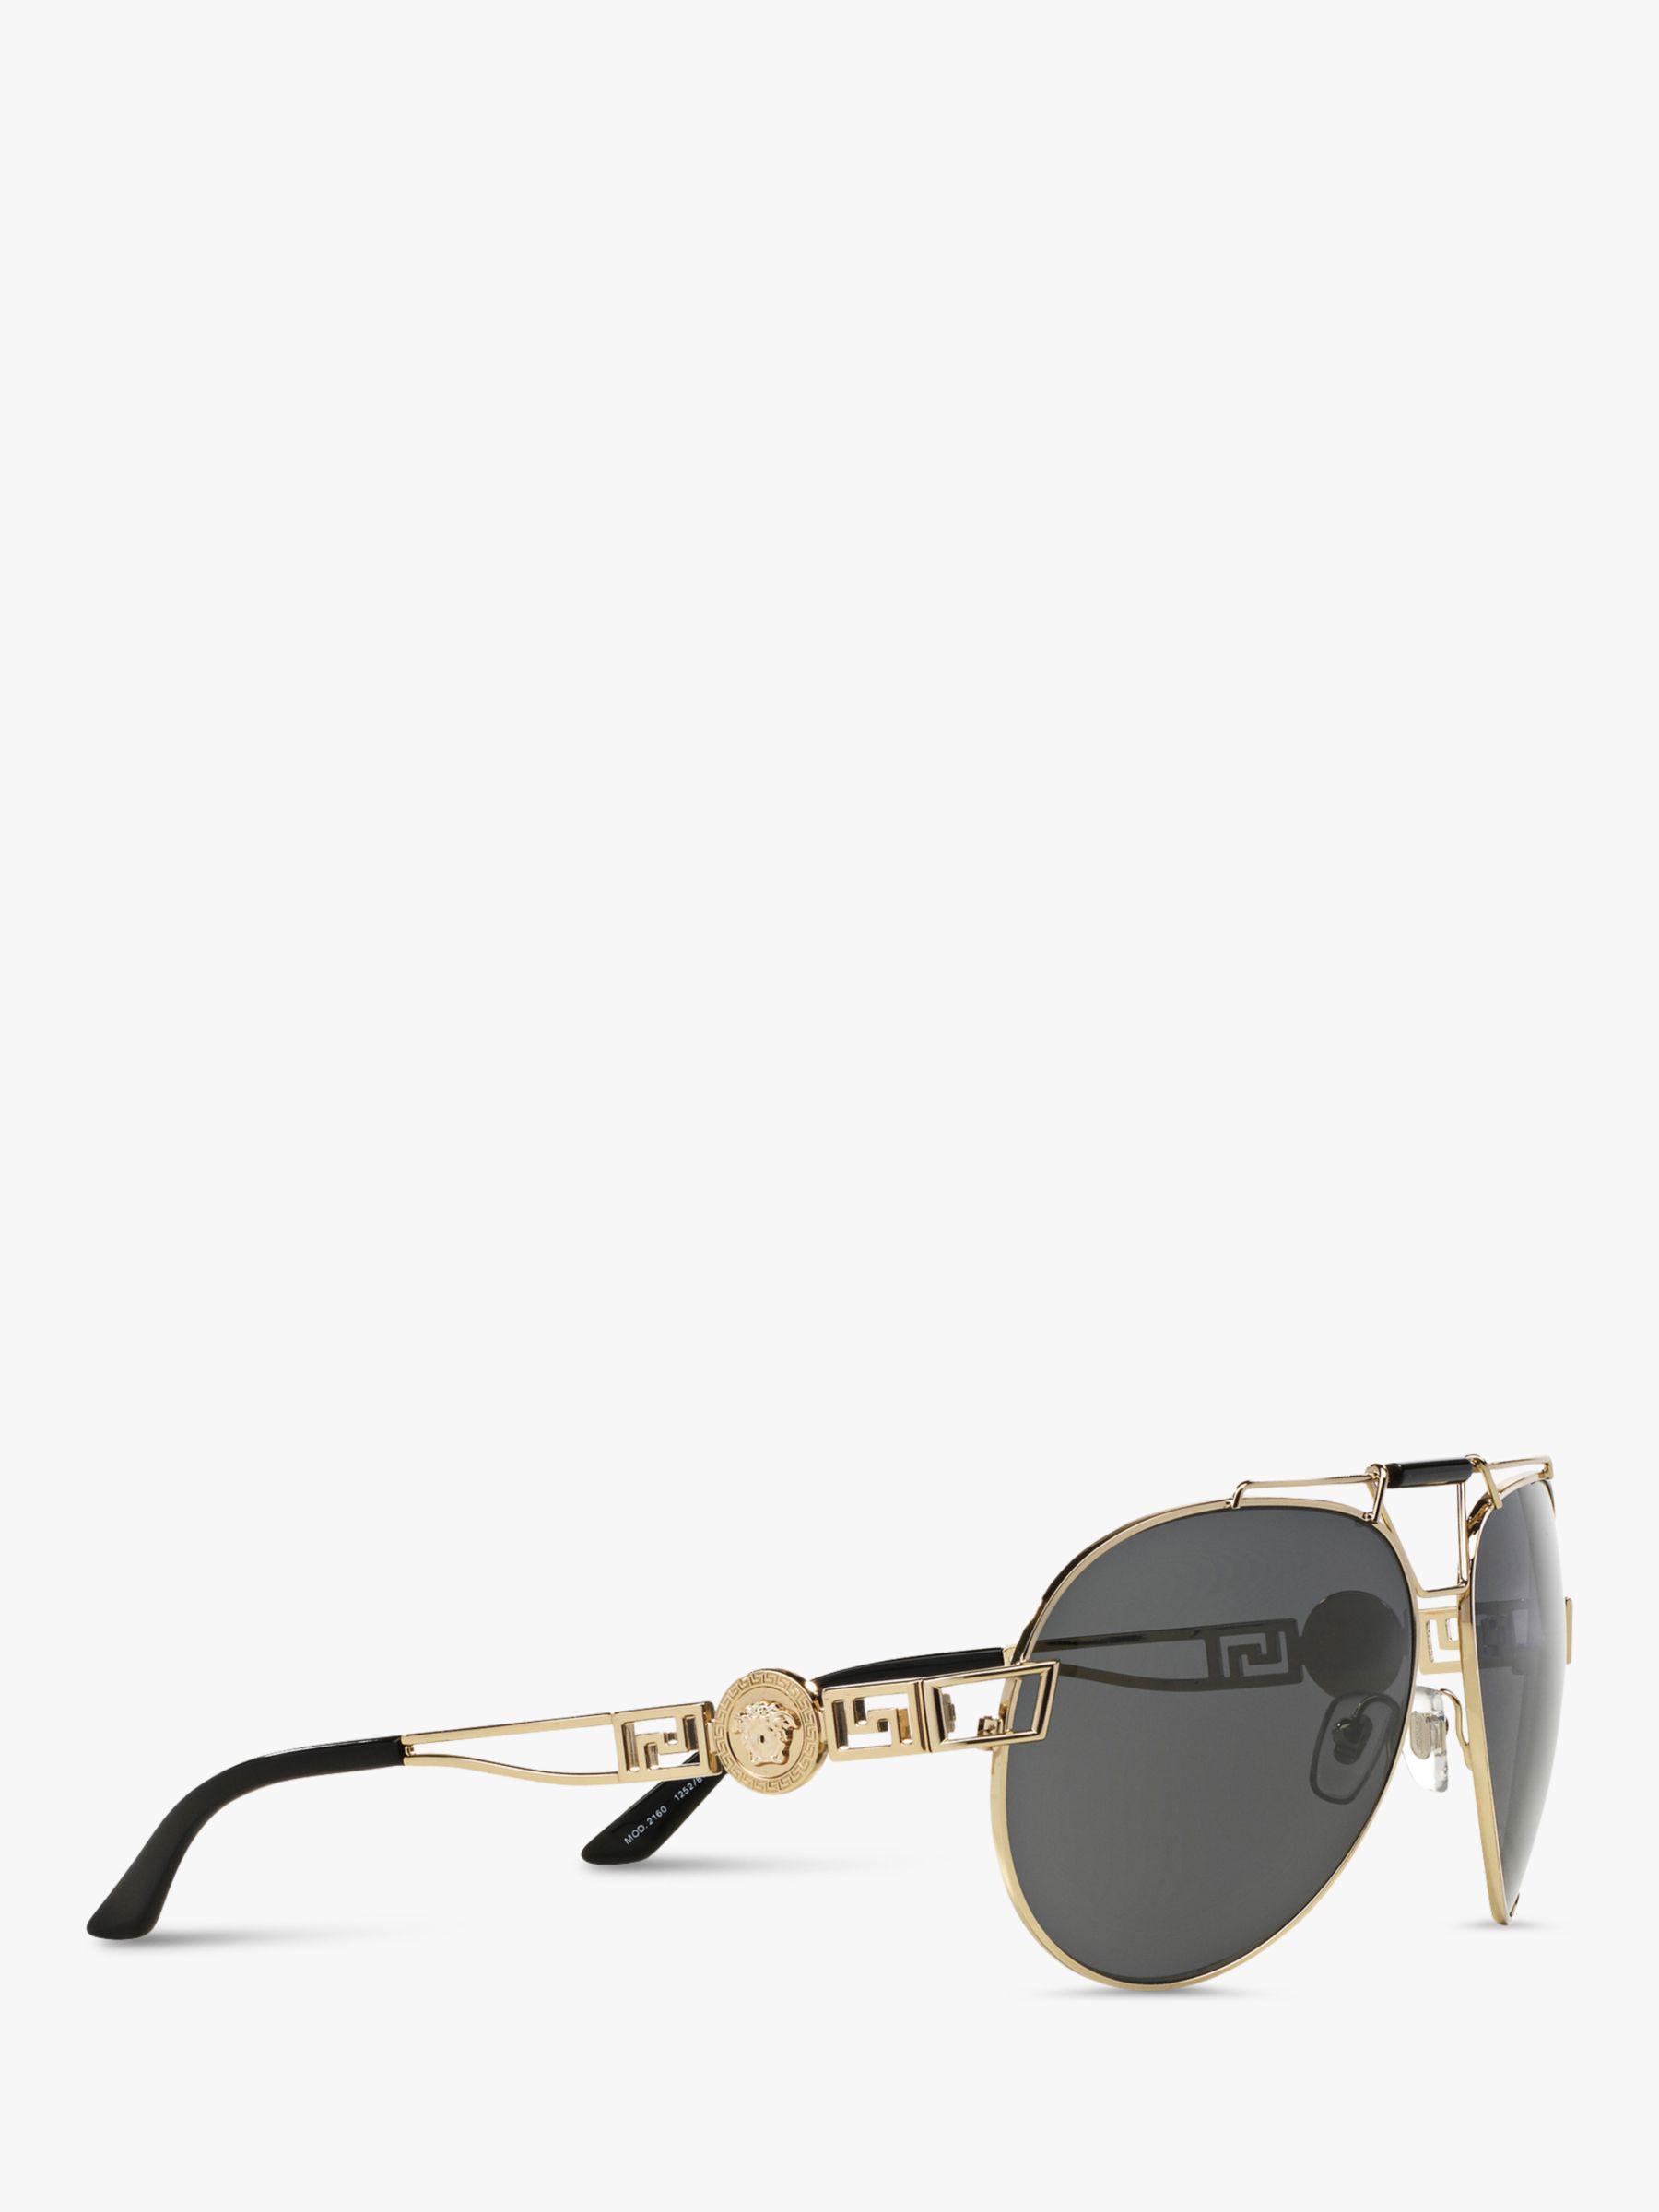 992f72686e910 Versace Ve2160 Women s Aviator Sunglasses in Gray - Lyst